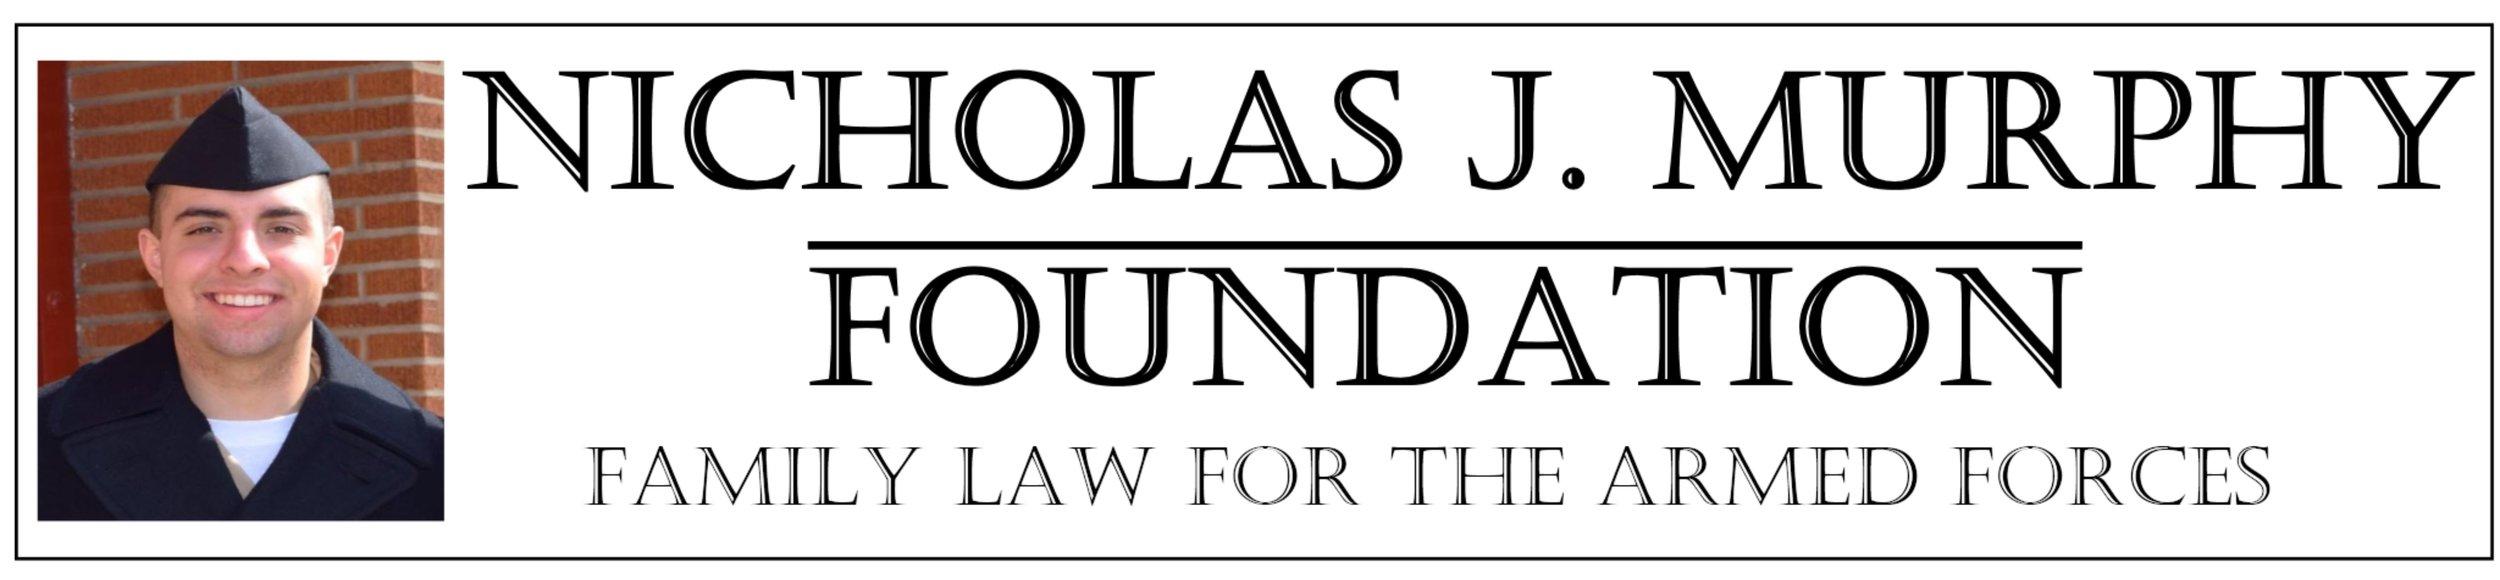 Nick Murphy Foundation logo revised 070518 family law.jpeg